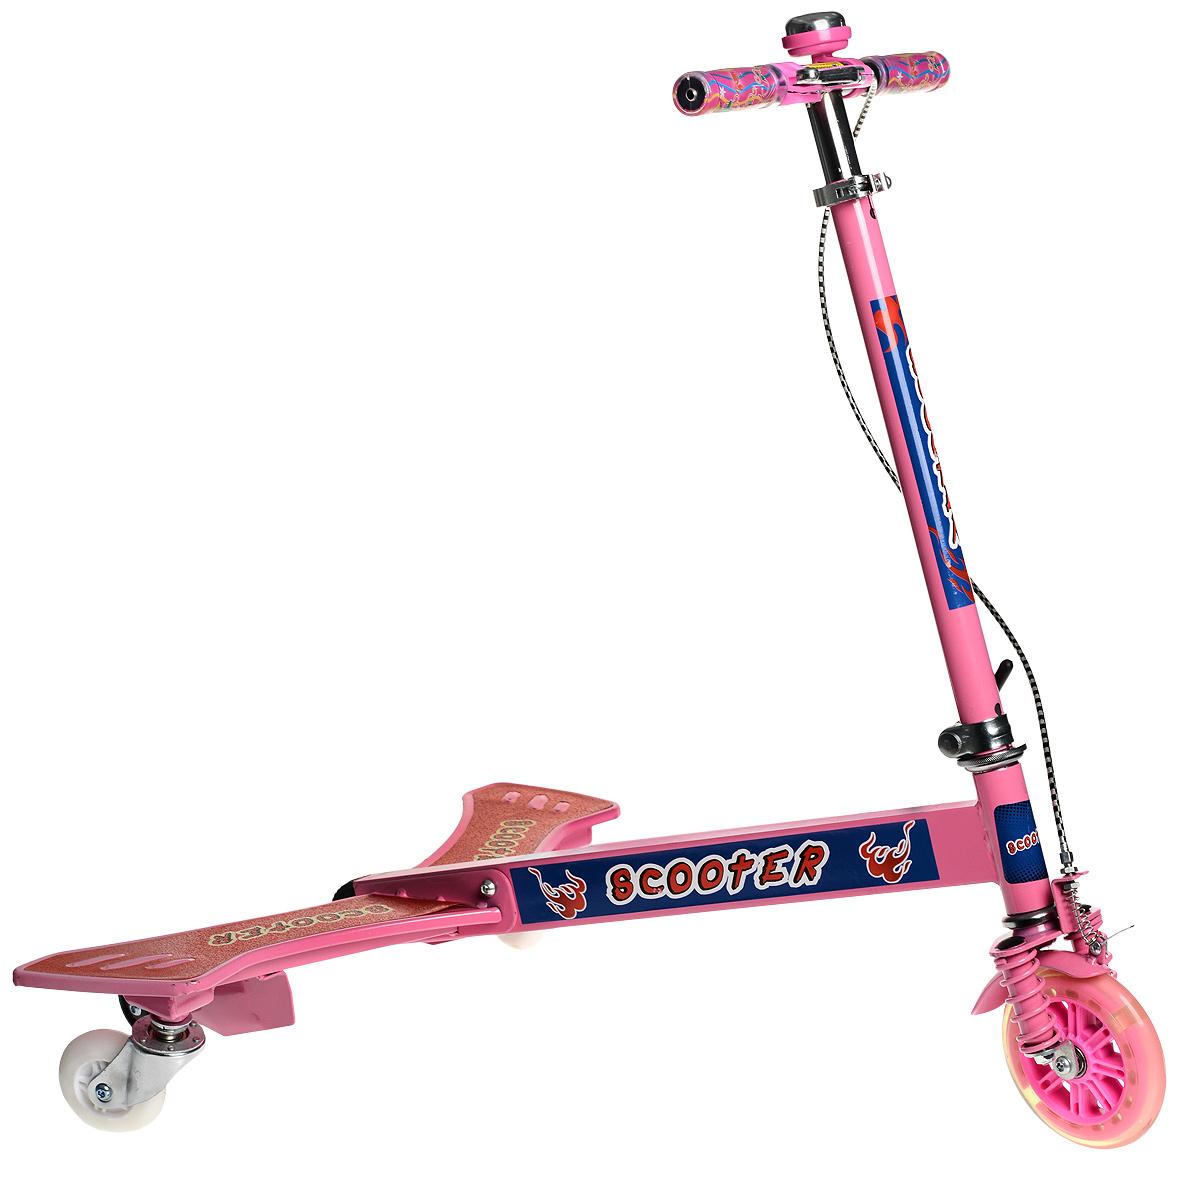 WSBD World Самокат тридер, цвет: розовый. BY859345, Concord Toys International Limited